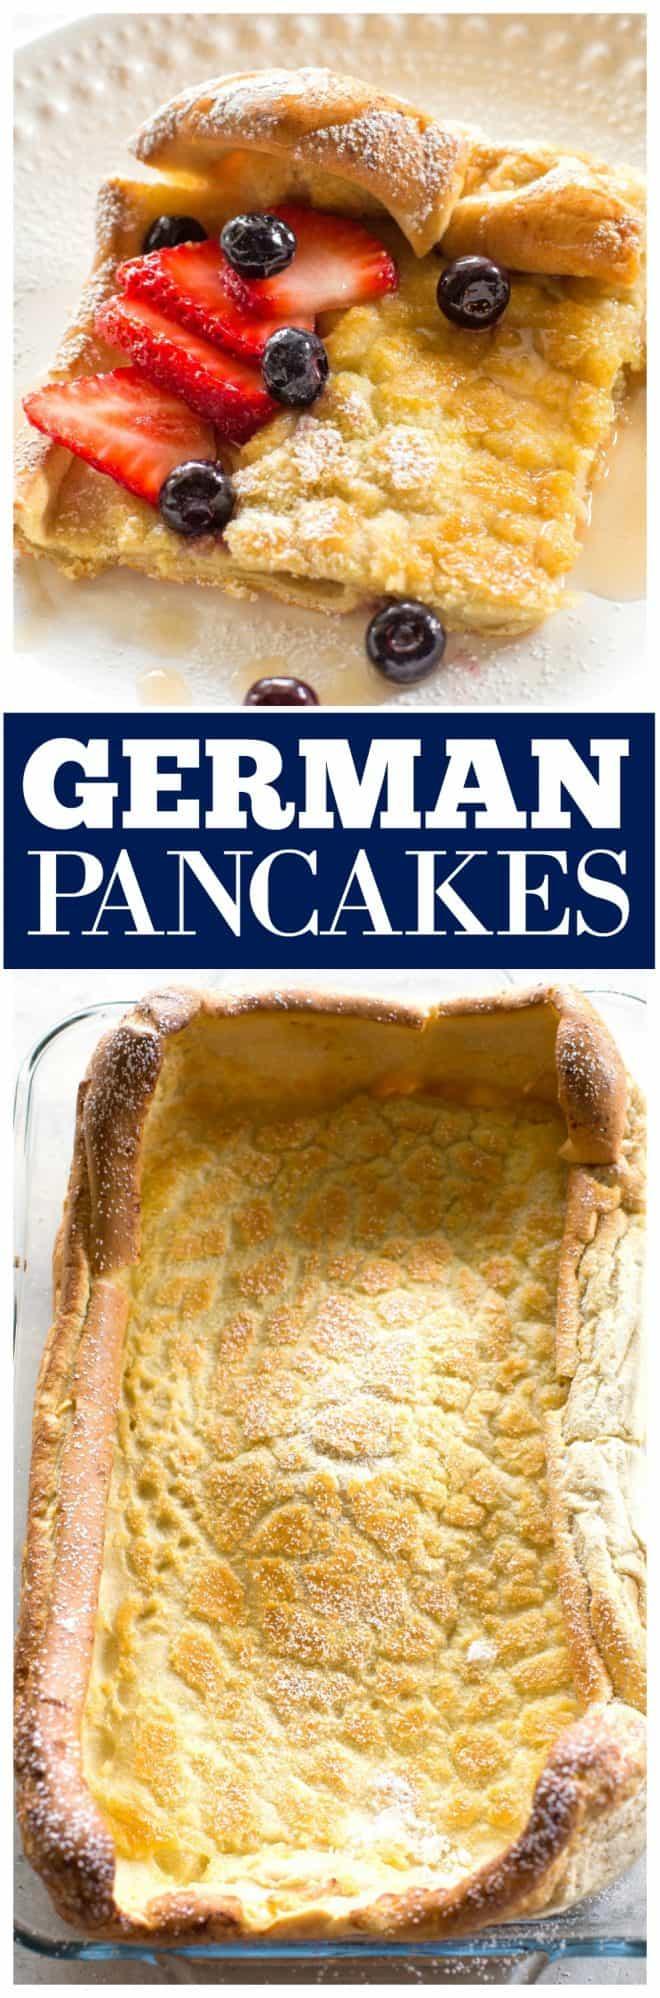 German Pancakes with fruit